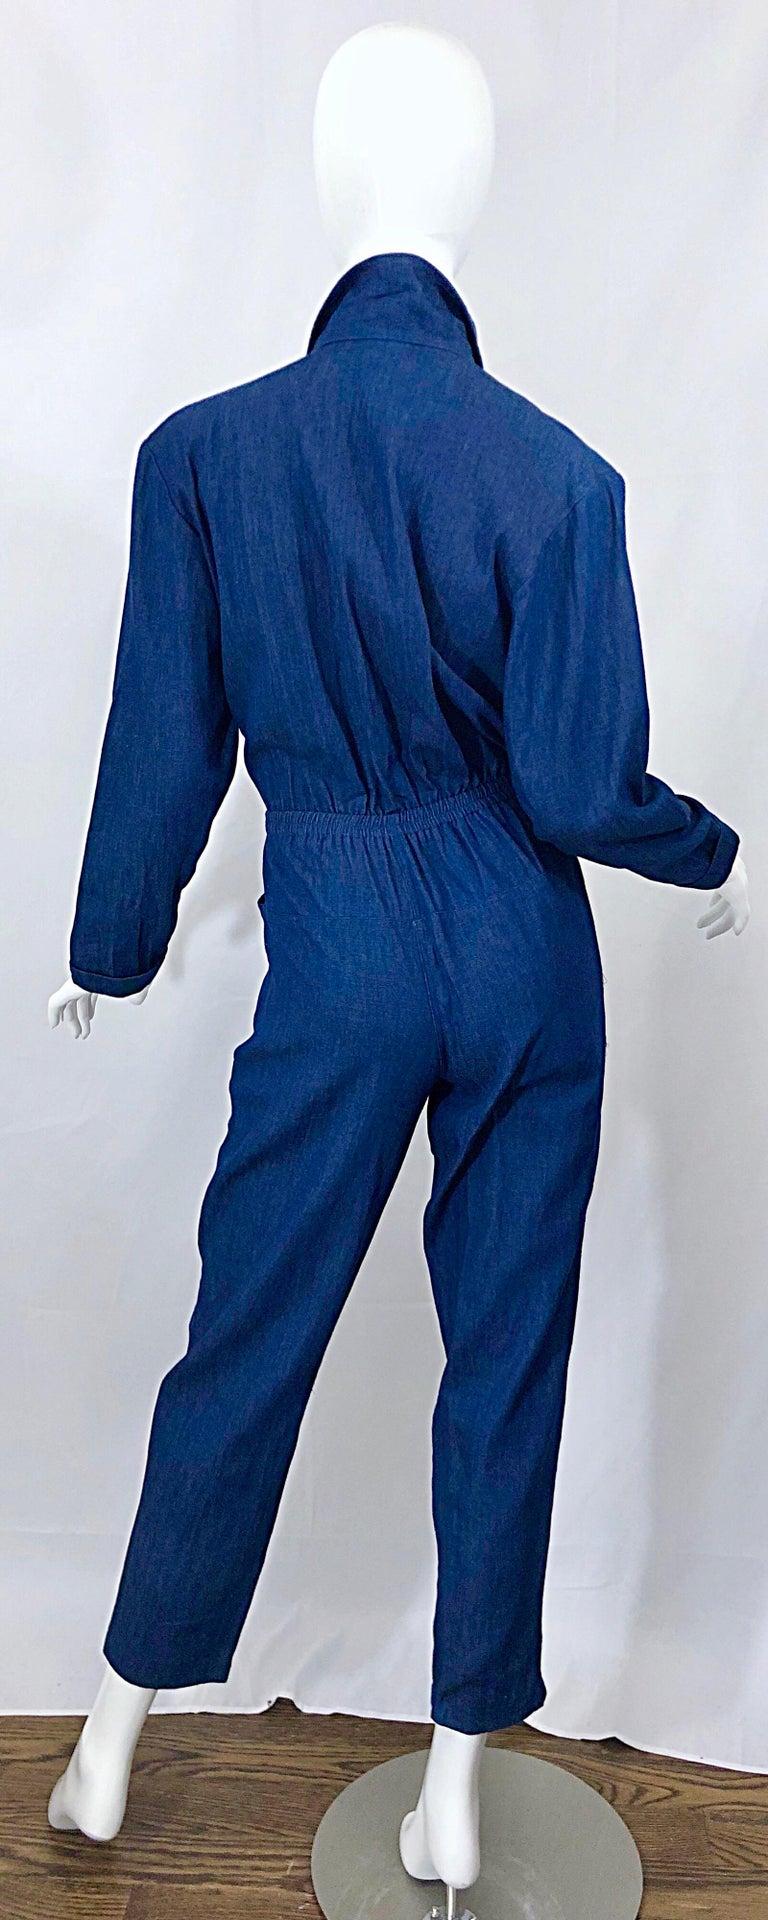 Amazing 1990s French Designer Blue Jean Denim + Rhinestone Pear Vintage Jumpsuit For Sale 8